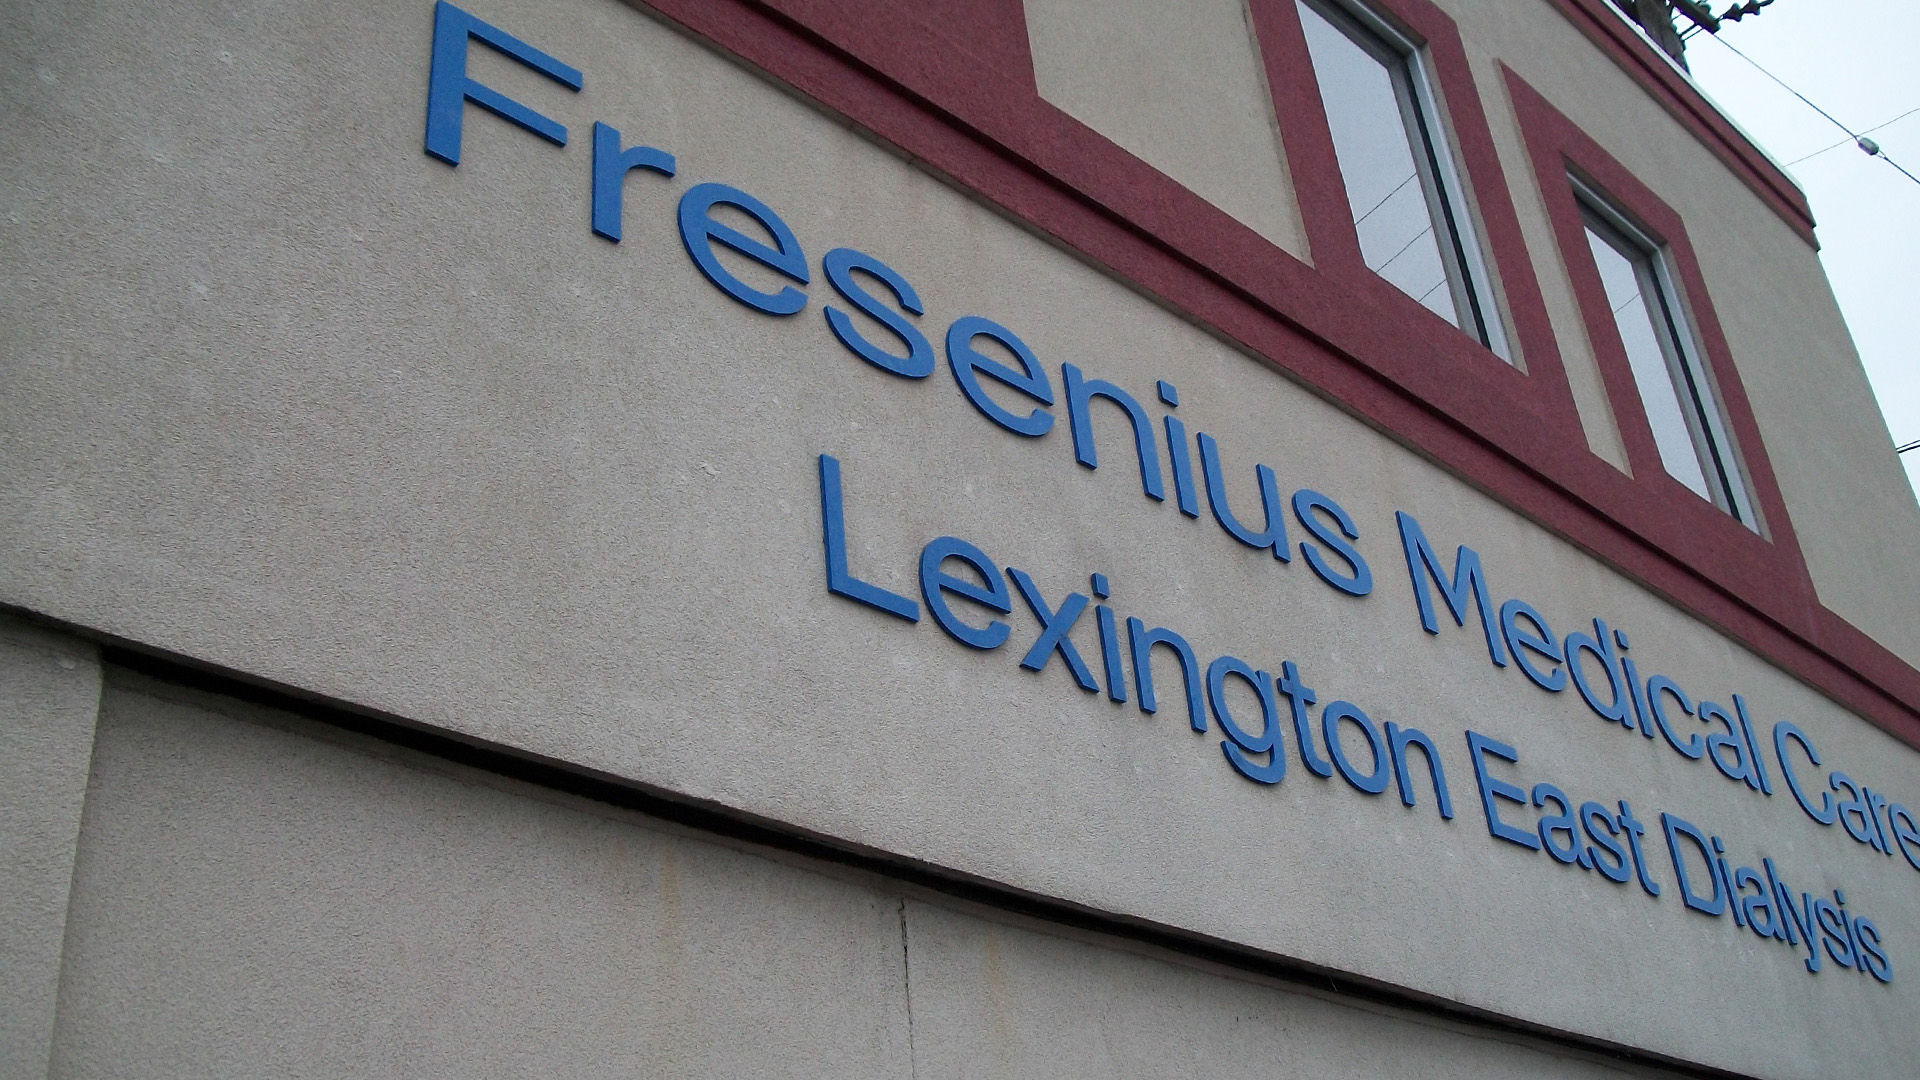 Fresenius dialysis Lexington company lettering